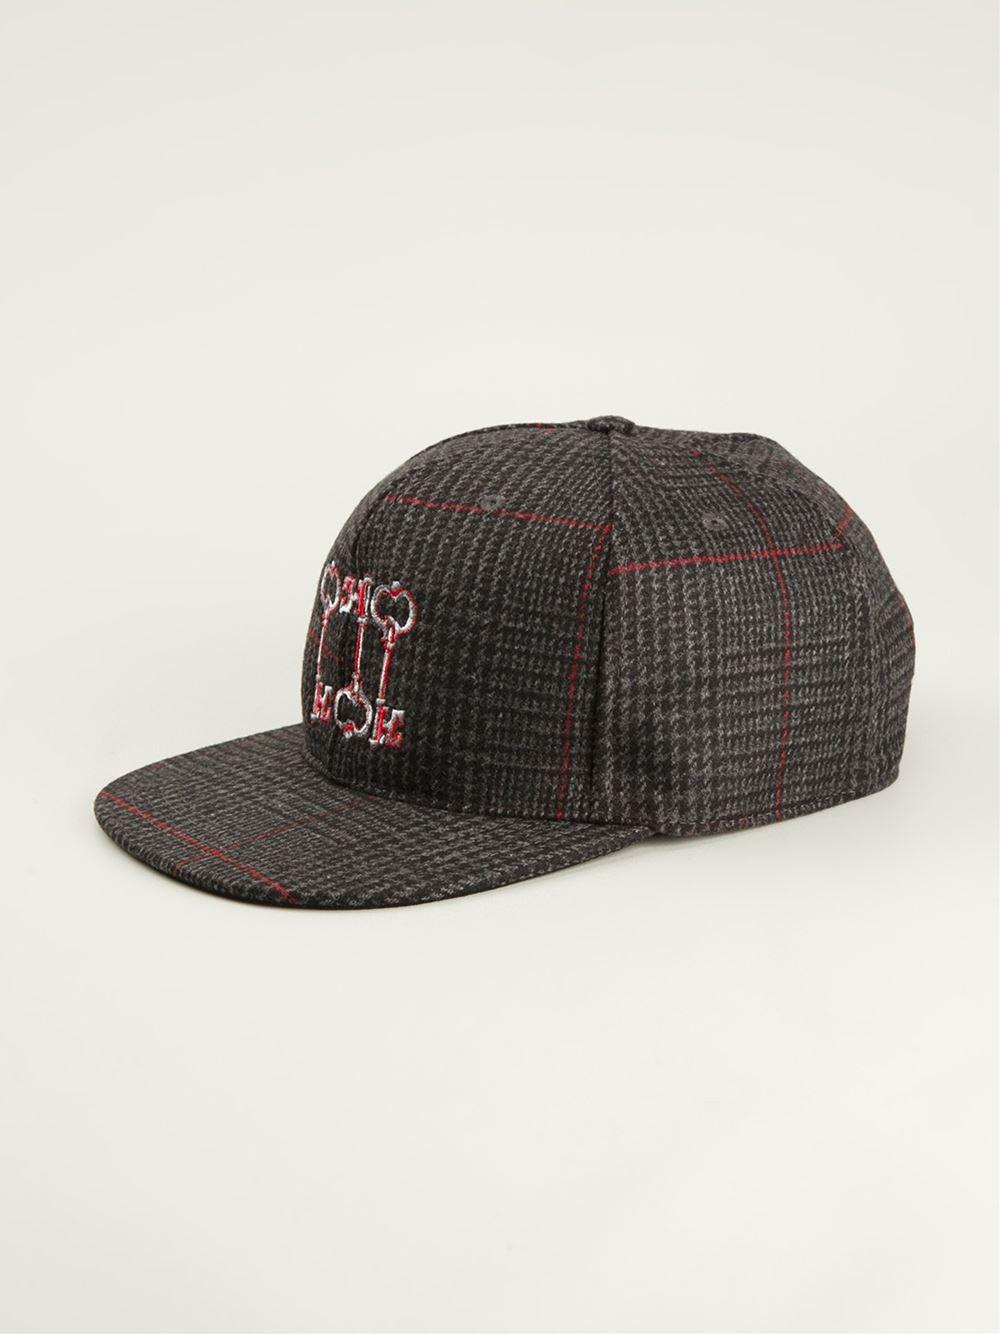 Lyst Dolce Amp Gabbana Tweed Baseball Cap In Black For Men